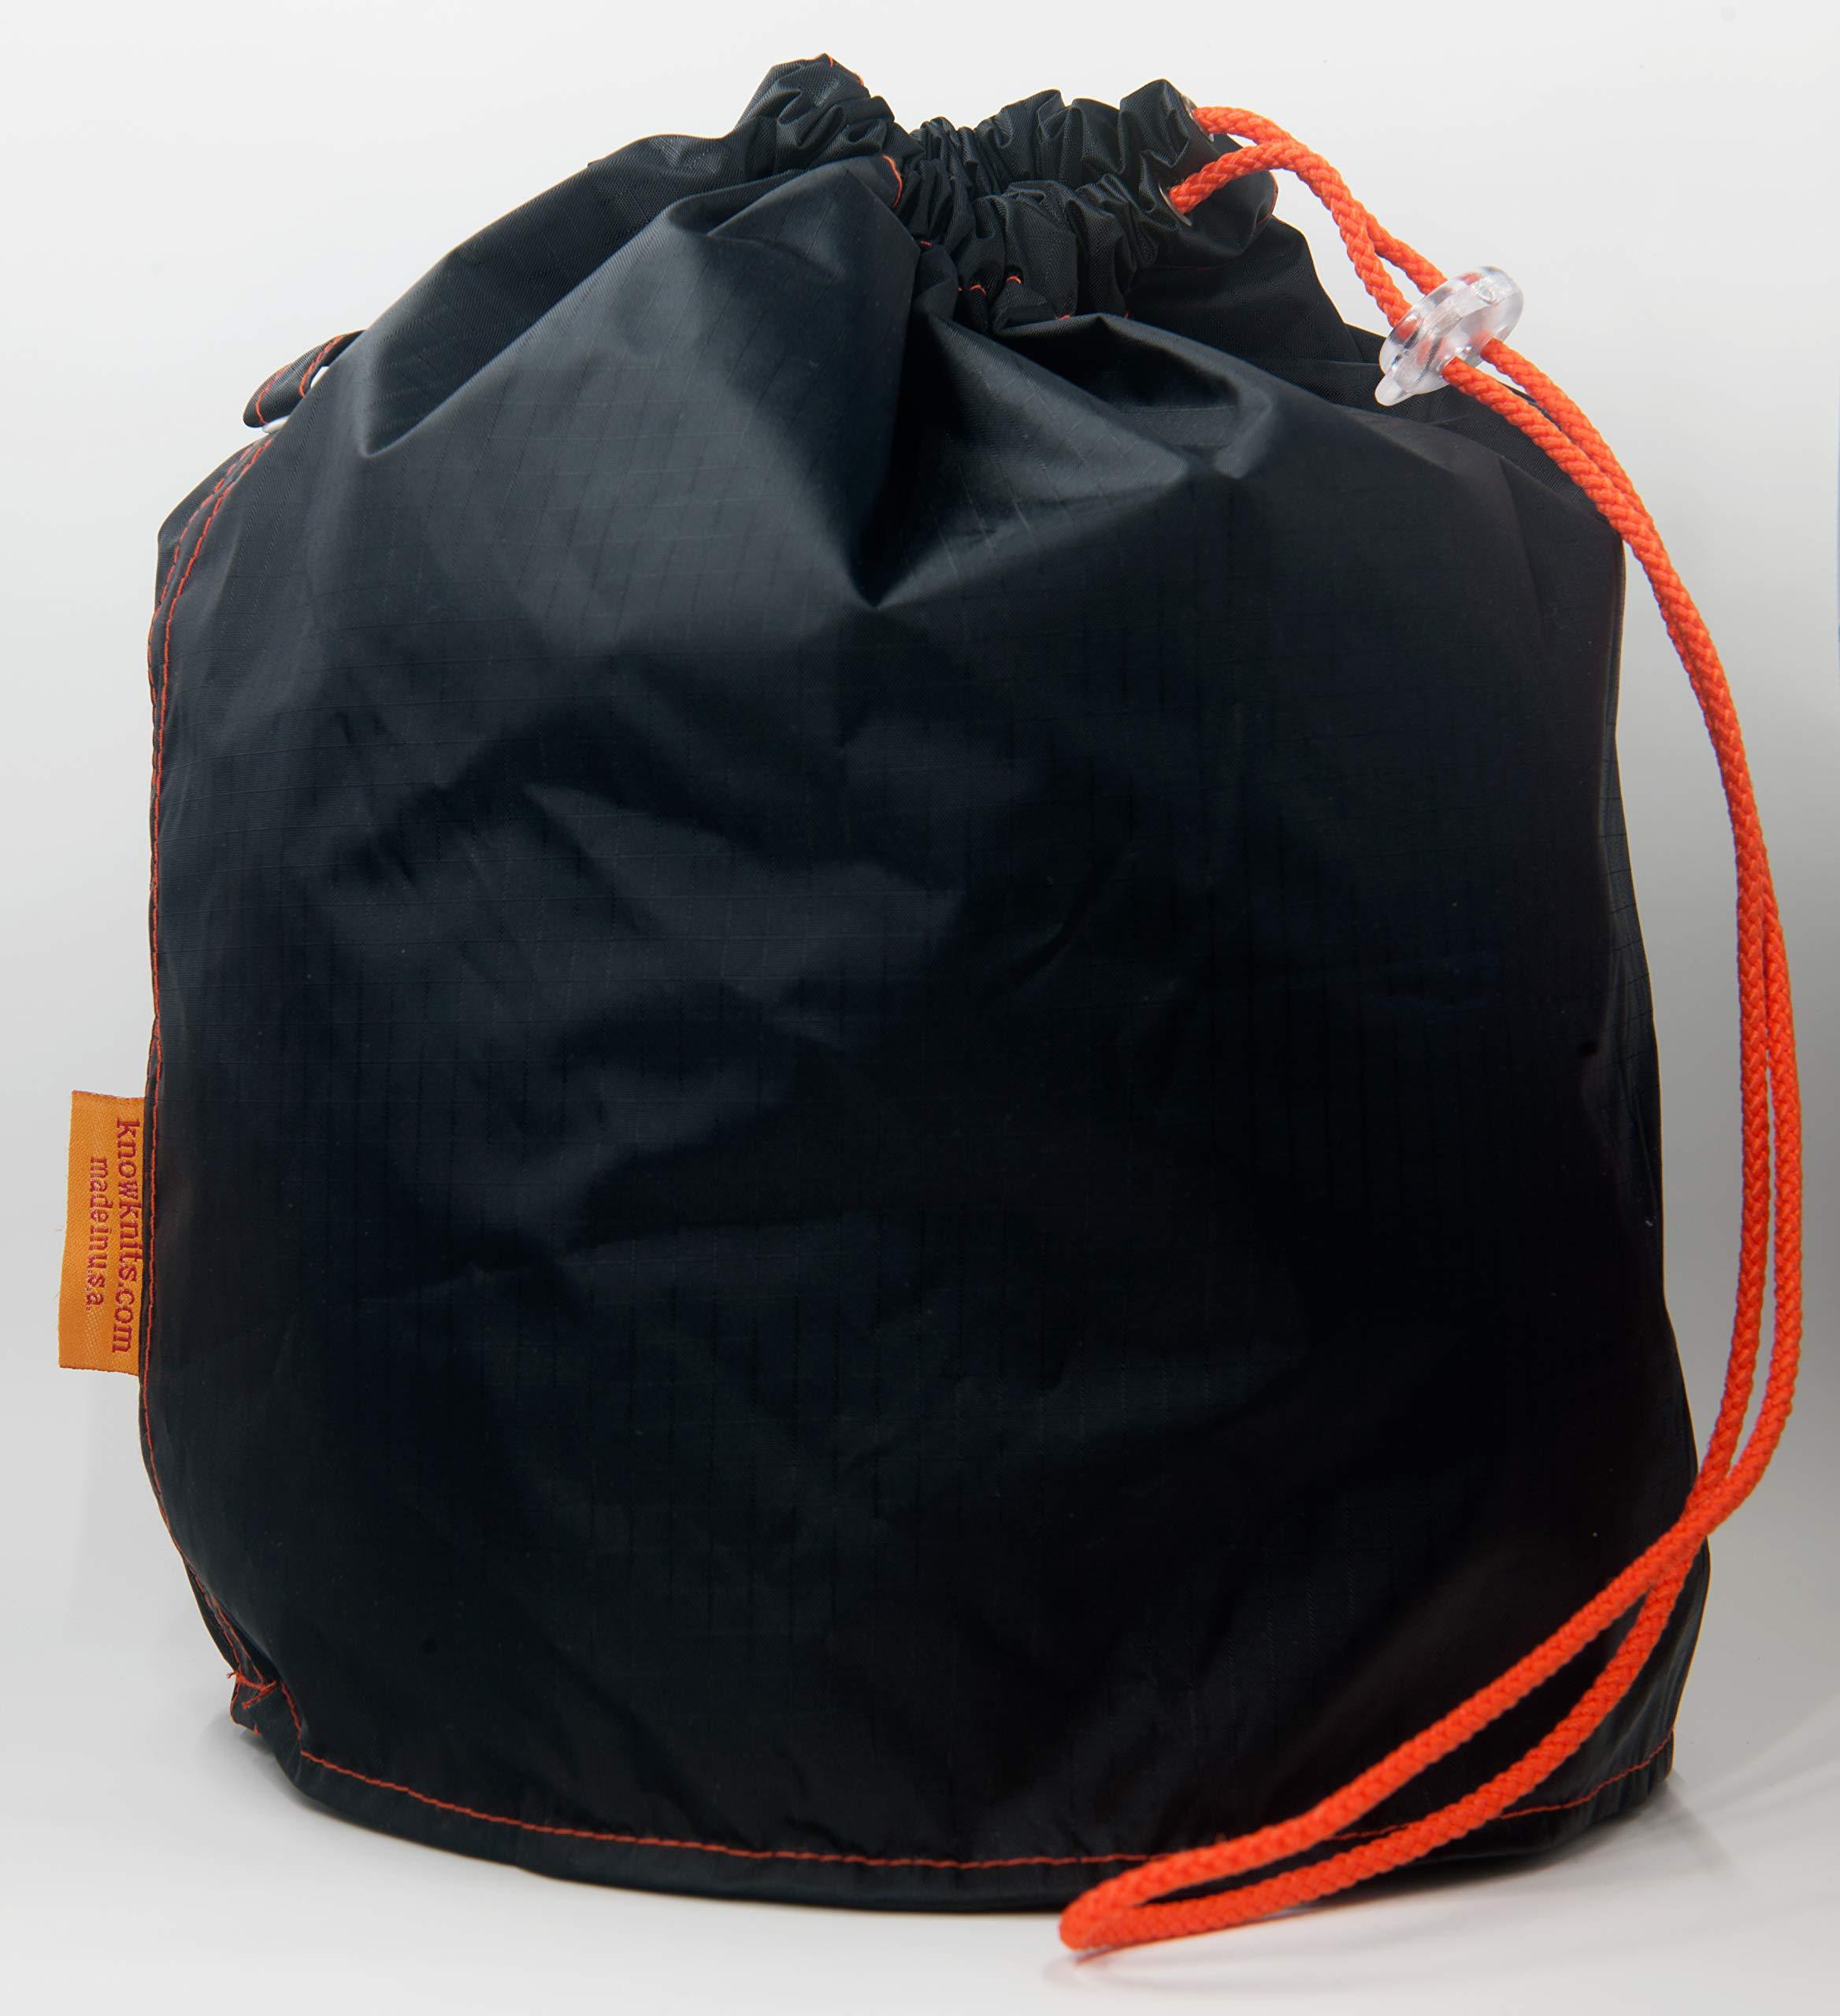 GoKnit Black Nylon Pouch Knitting Project Bag with Loop & Drawstring (Medium)